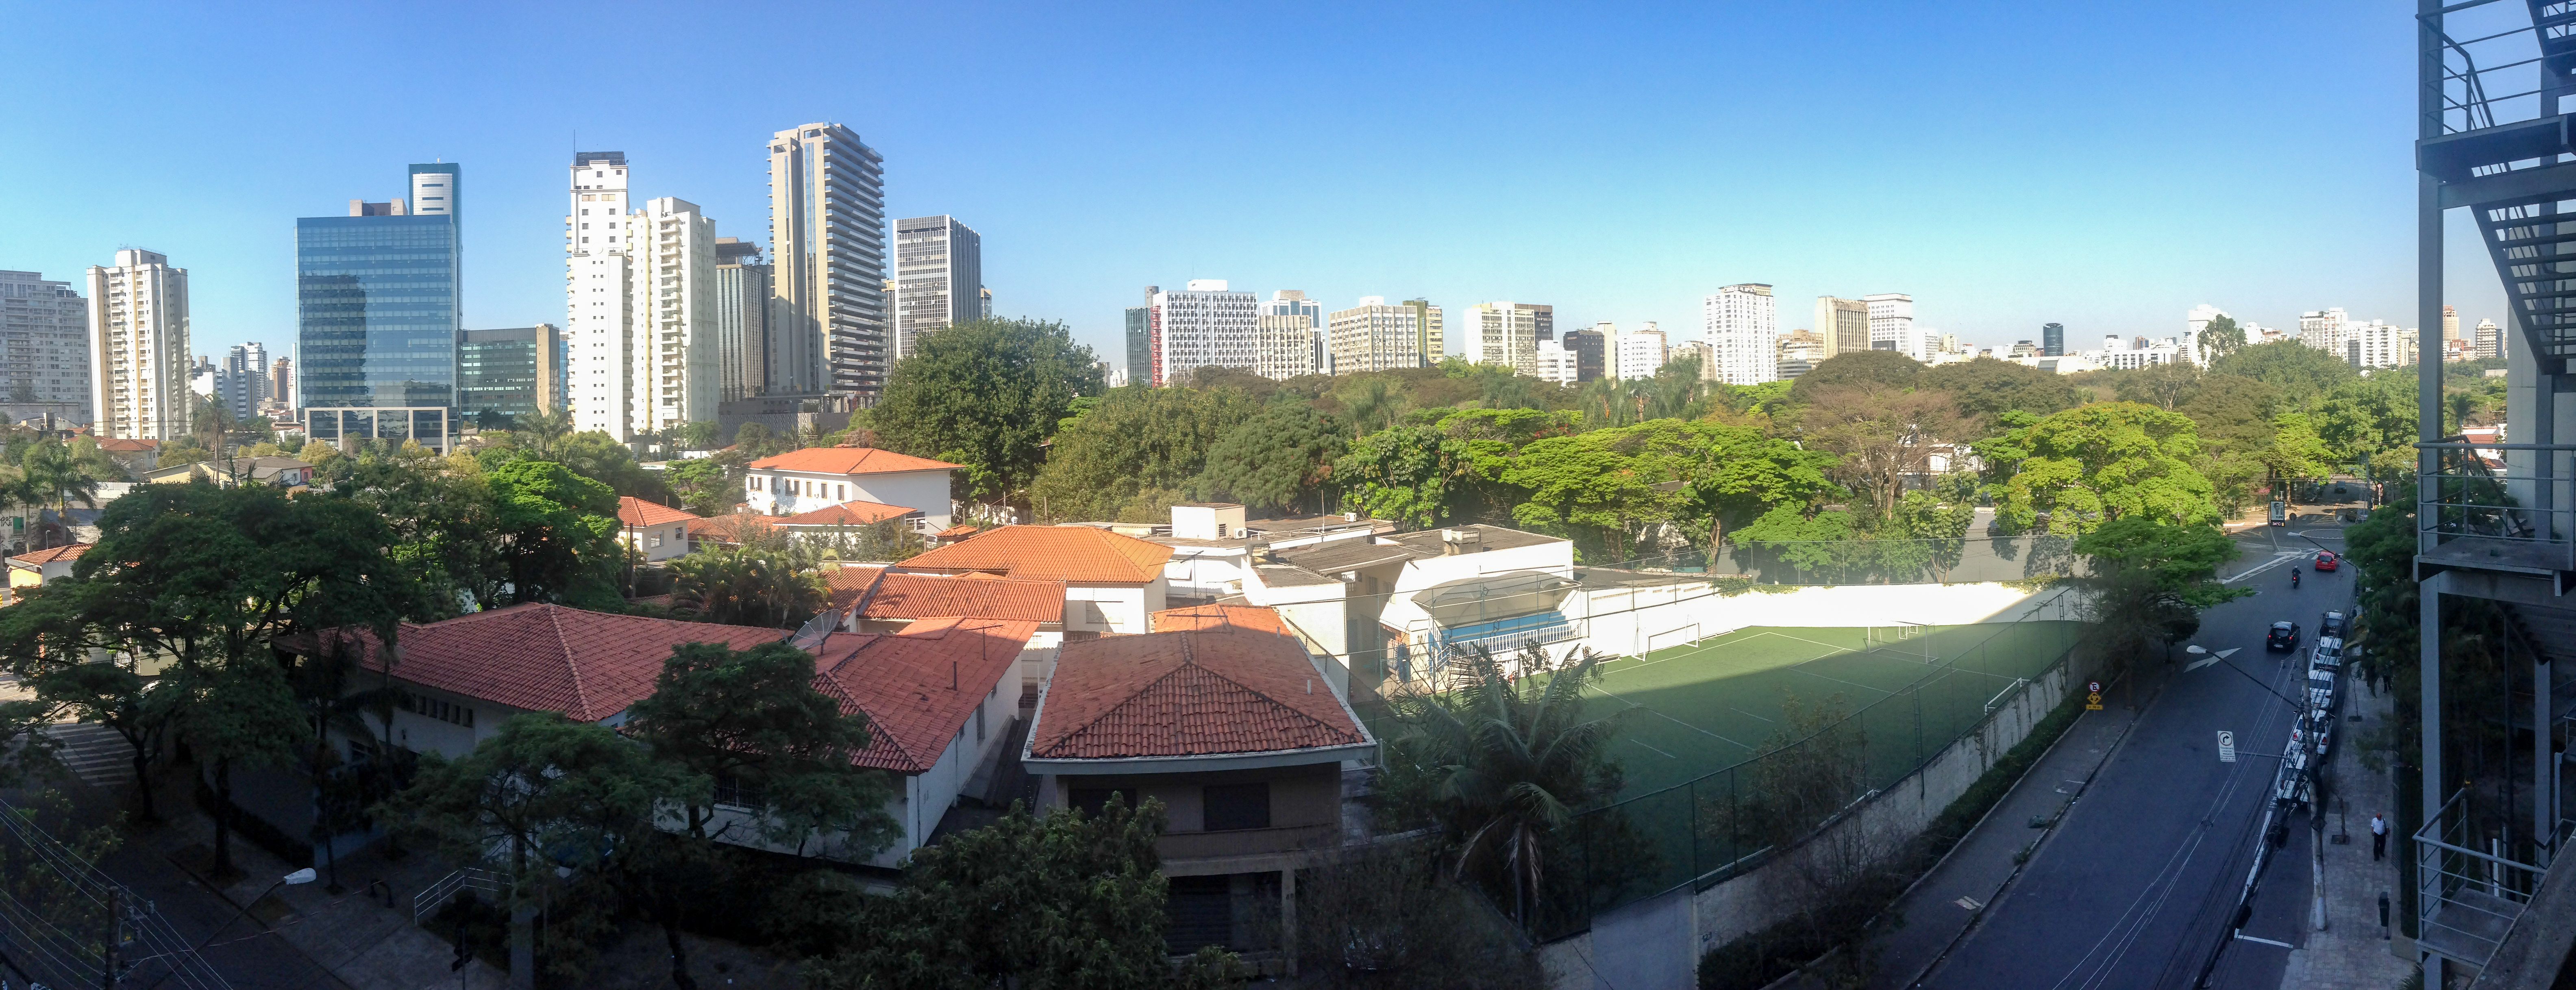 Eldorado São Paulo fonte: upload.wikimedia.org